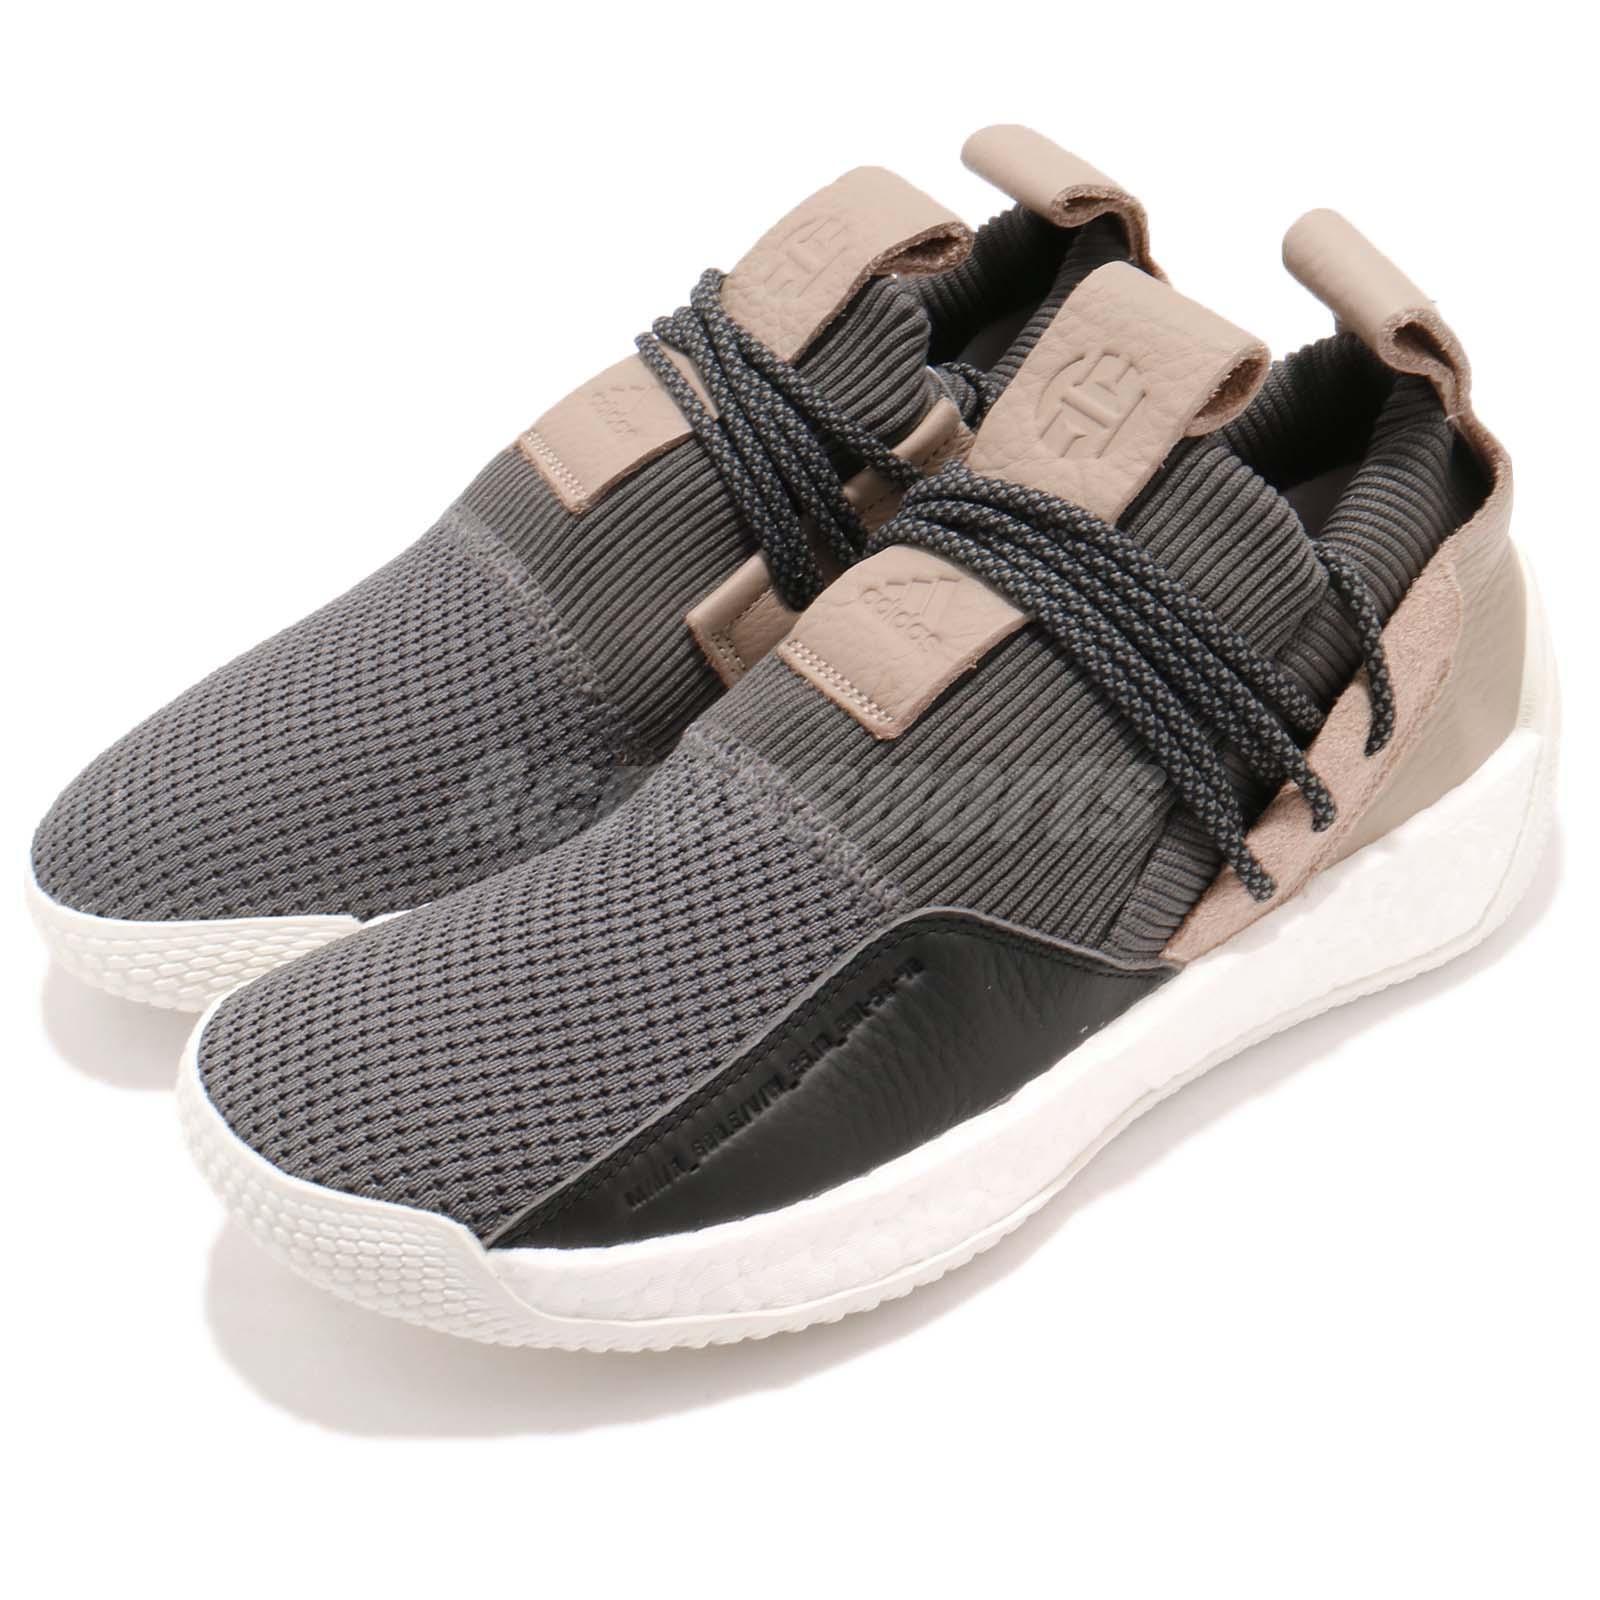 Adidas Harden LS 2 2 2 Lace II James Boost grigio nero bianca Uomo Lifestyle B28170 747b01